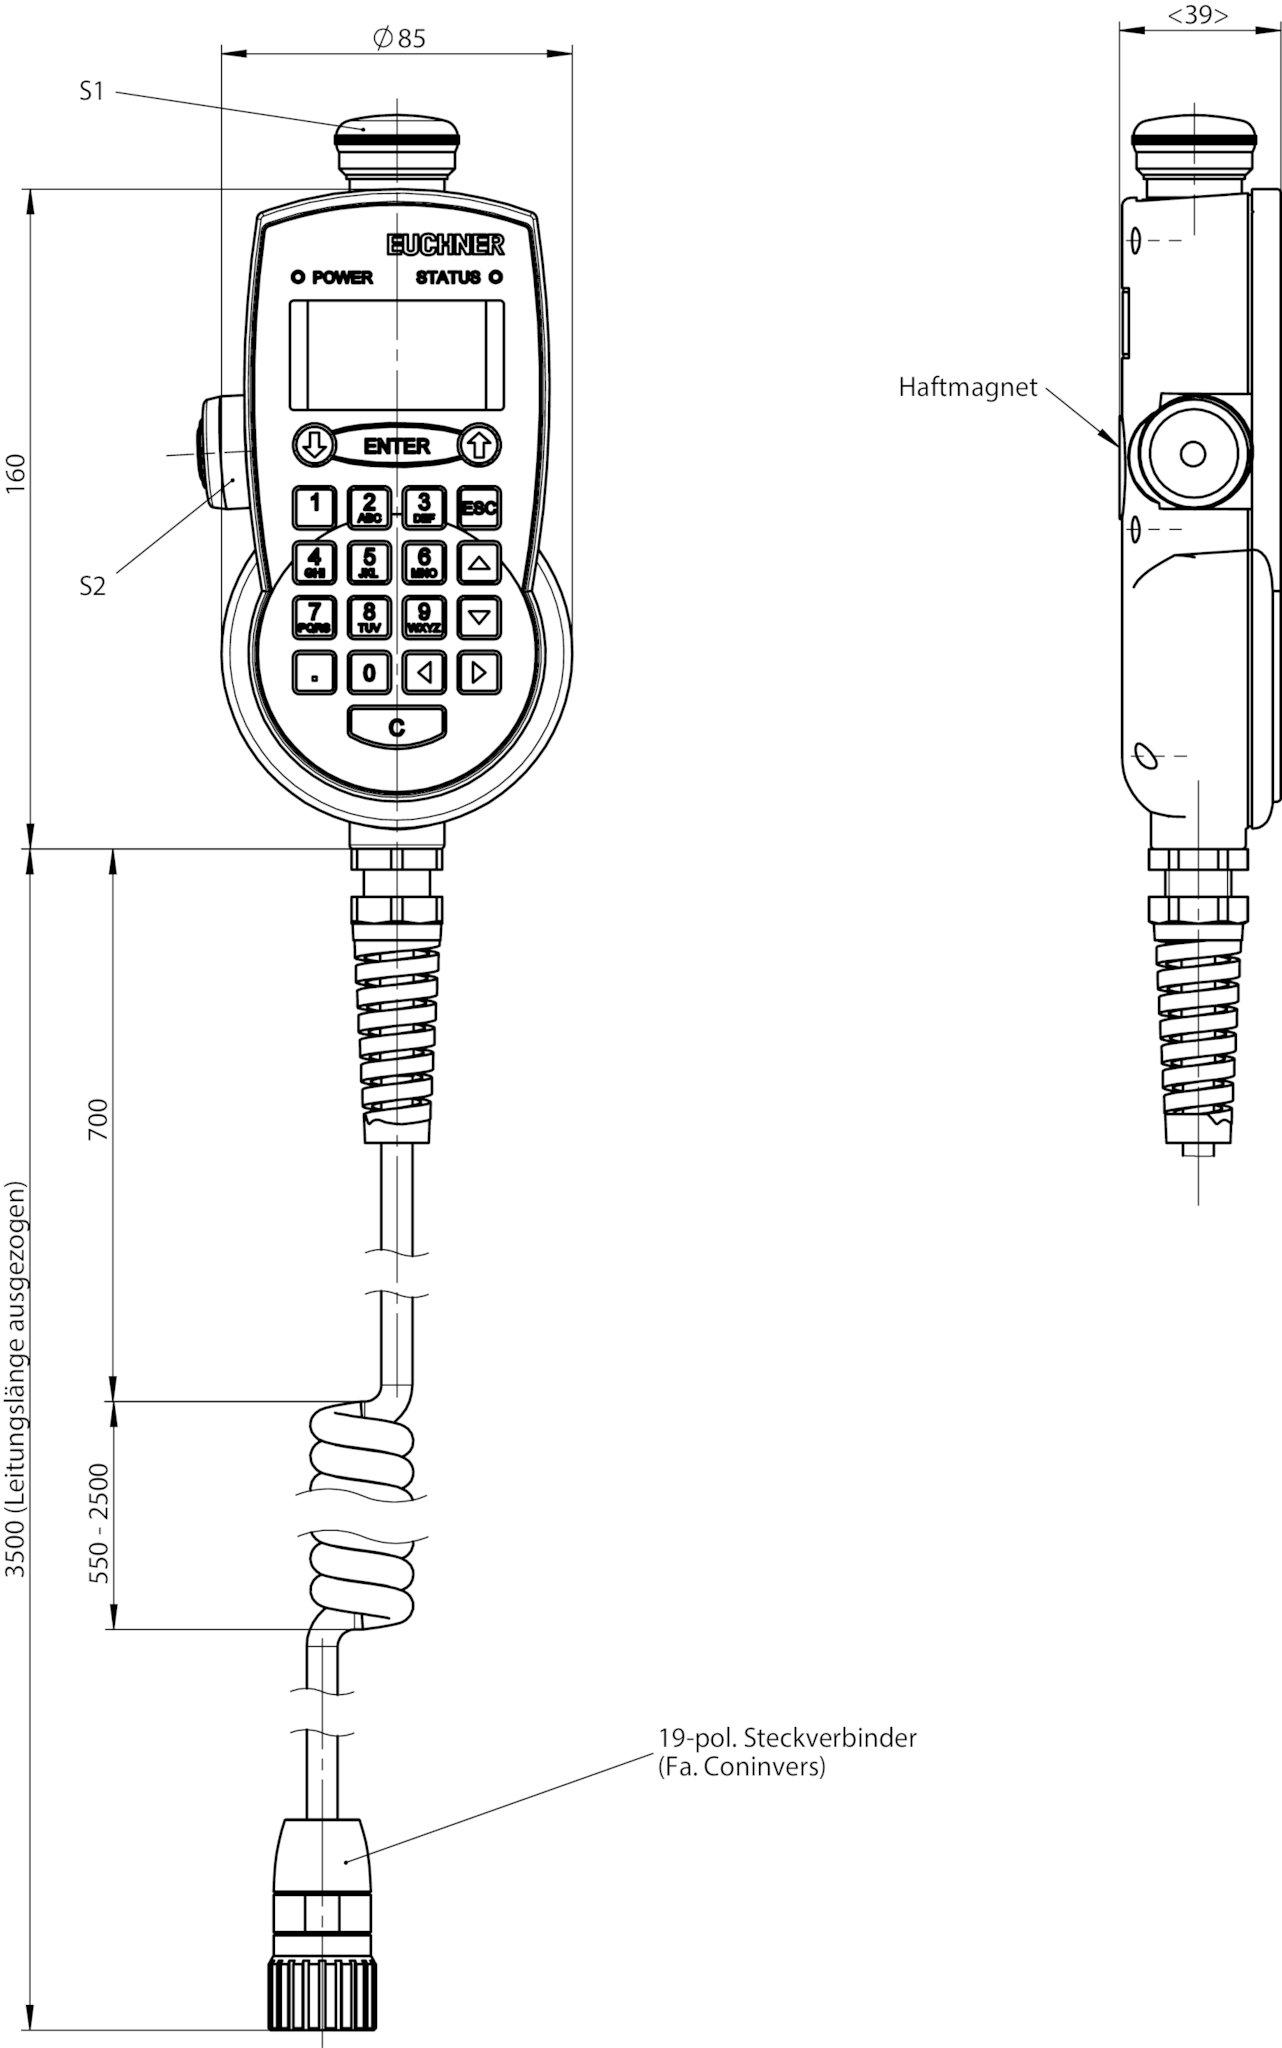 126046  Prong Generator Plug Wiring Diagram on 240 volt 4 wire wiring diagram, 3 phase switch wiring diagram, electric oven wiring diagram, cat 3 wiring diagram, electrical plug diagram, 3 wire range outlet diagram, 3 prong power diagram, primary single phase capacitor wiring diagram, dryer wiring diagram, outlet wiring diagram, 3 phase 4 wire plug diagram, 3 wire switch wiring diagram, ground fault circuit breaker wiring diagram, light switch wiring diagram, 3 prong switch diagram, 3 prong rocker switch wiring, 4 prong generator wiring diagram, wall socket wiring diagram, 3-pin flasher relay wiring diagram, electrical socket wiring diagram,